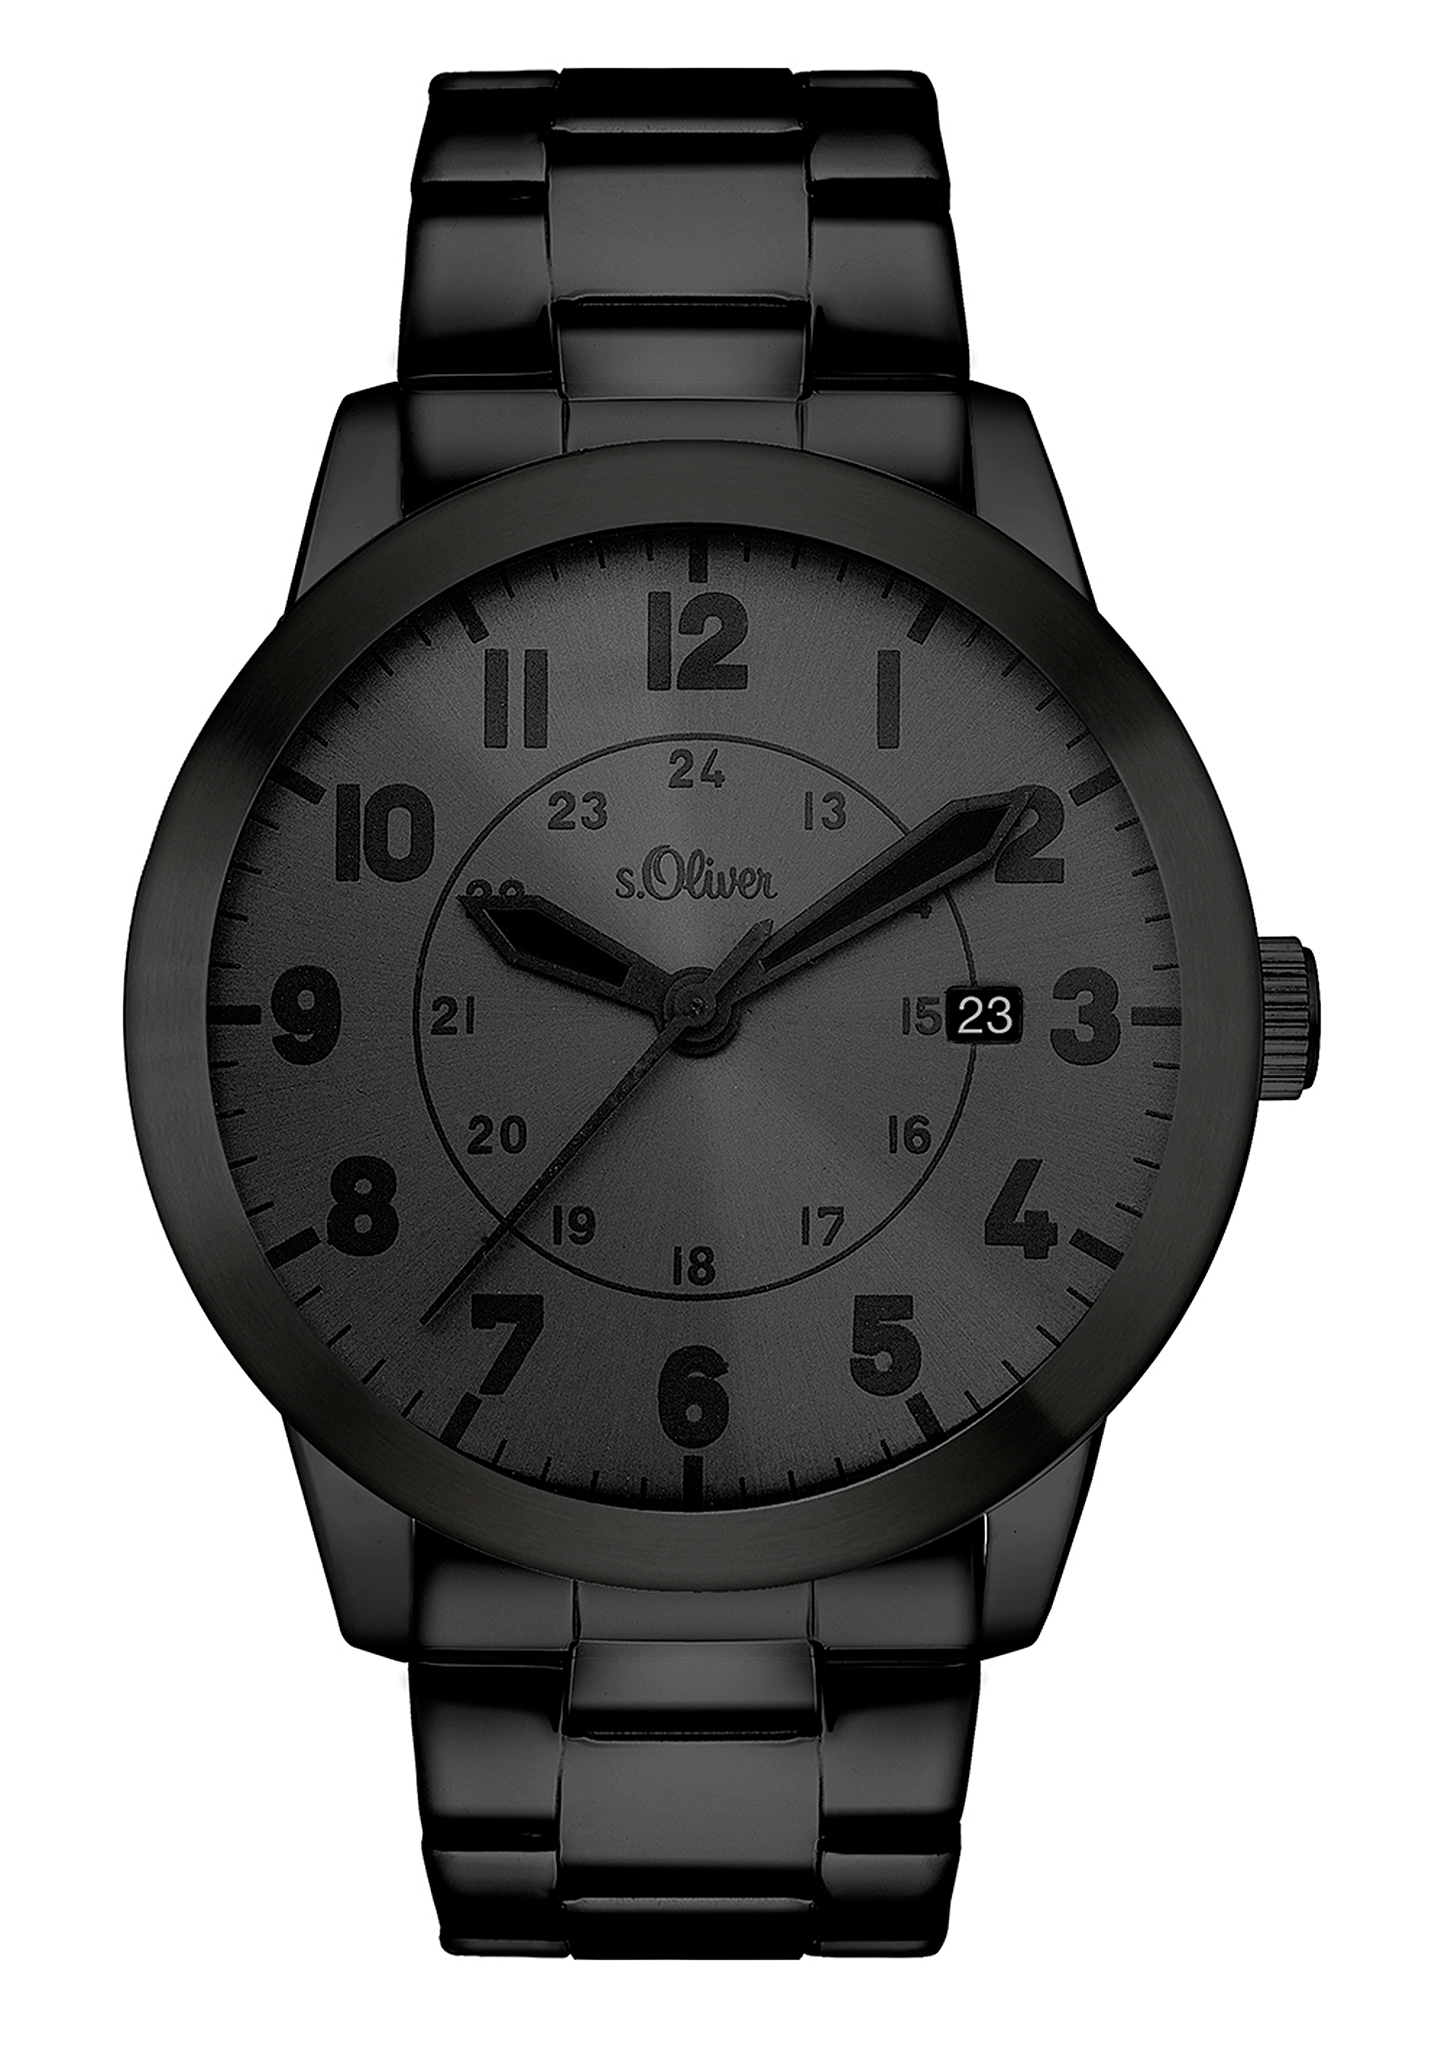 Armbanduhr   Uhren   Grau/schwarz   Edelstahl  glas   s.Oliver